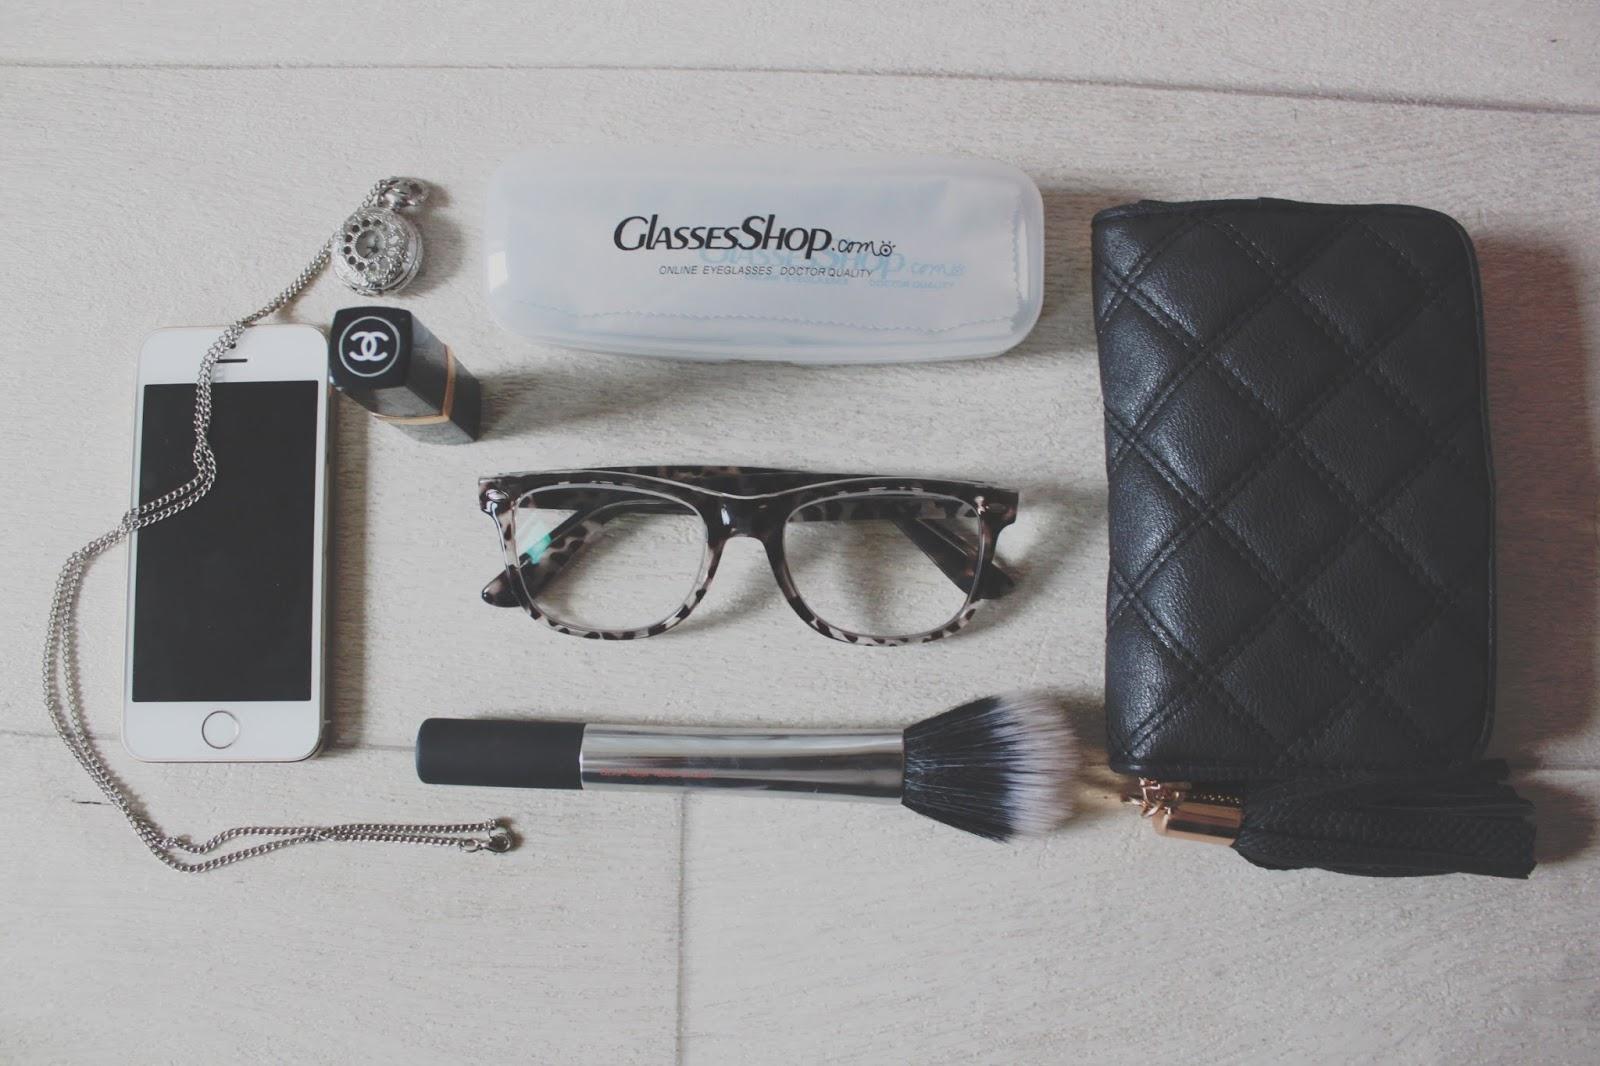 d605117183 GlassesShop Haul - Quirky New  Zebra  Print Glasses Review   Coupon Code!